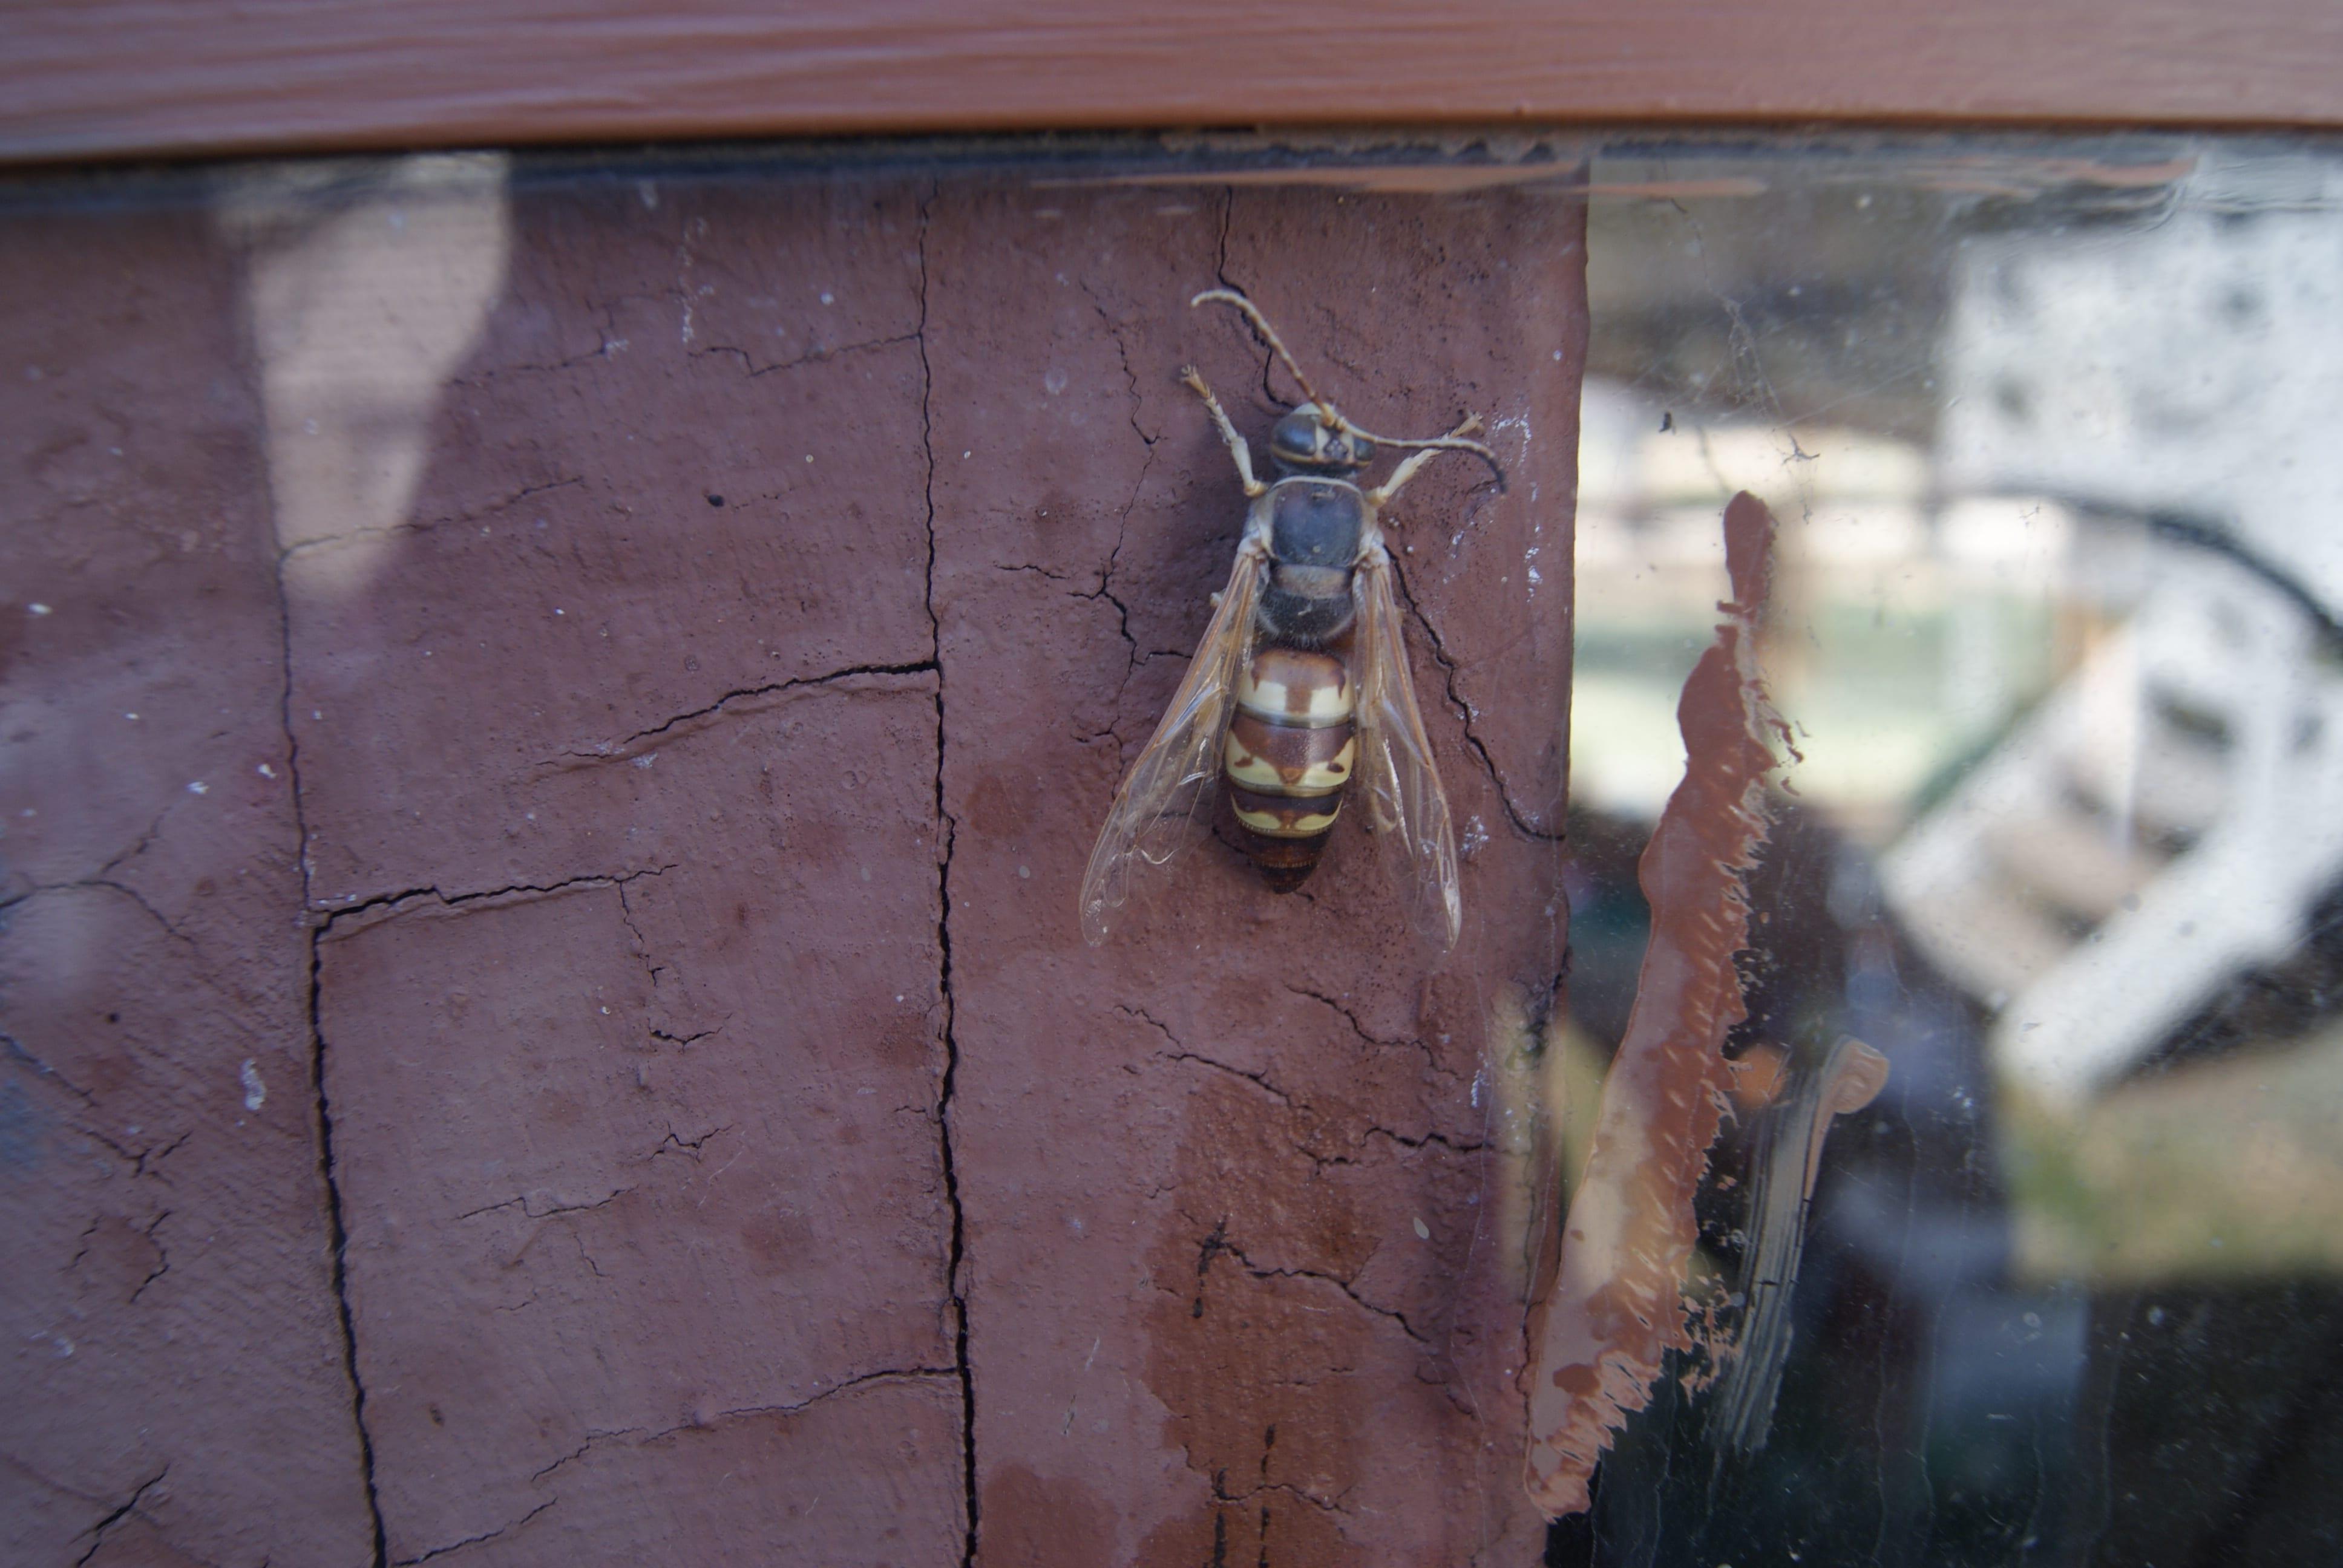 Stingers - Cicada Killers